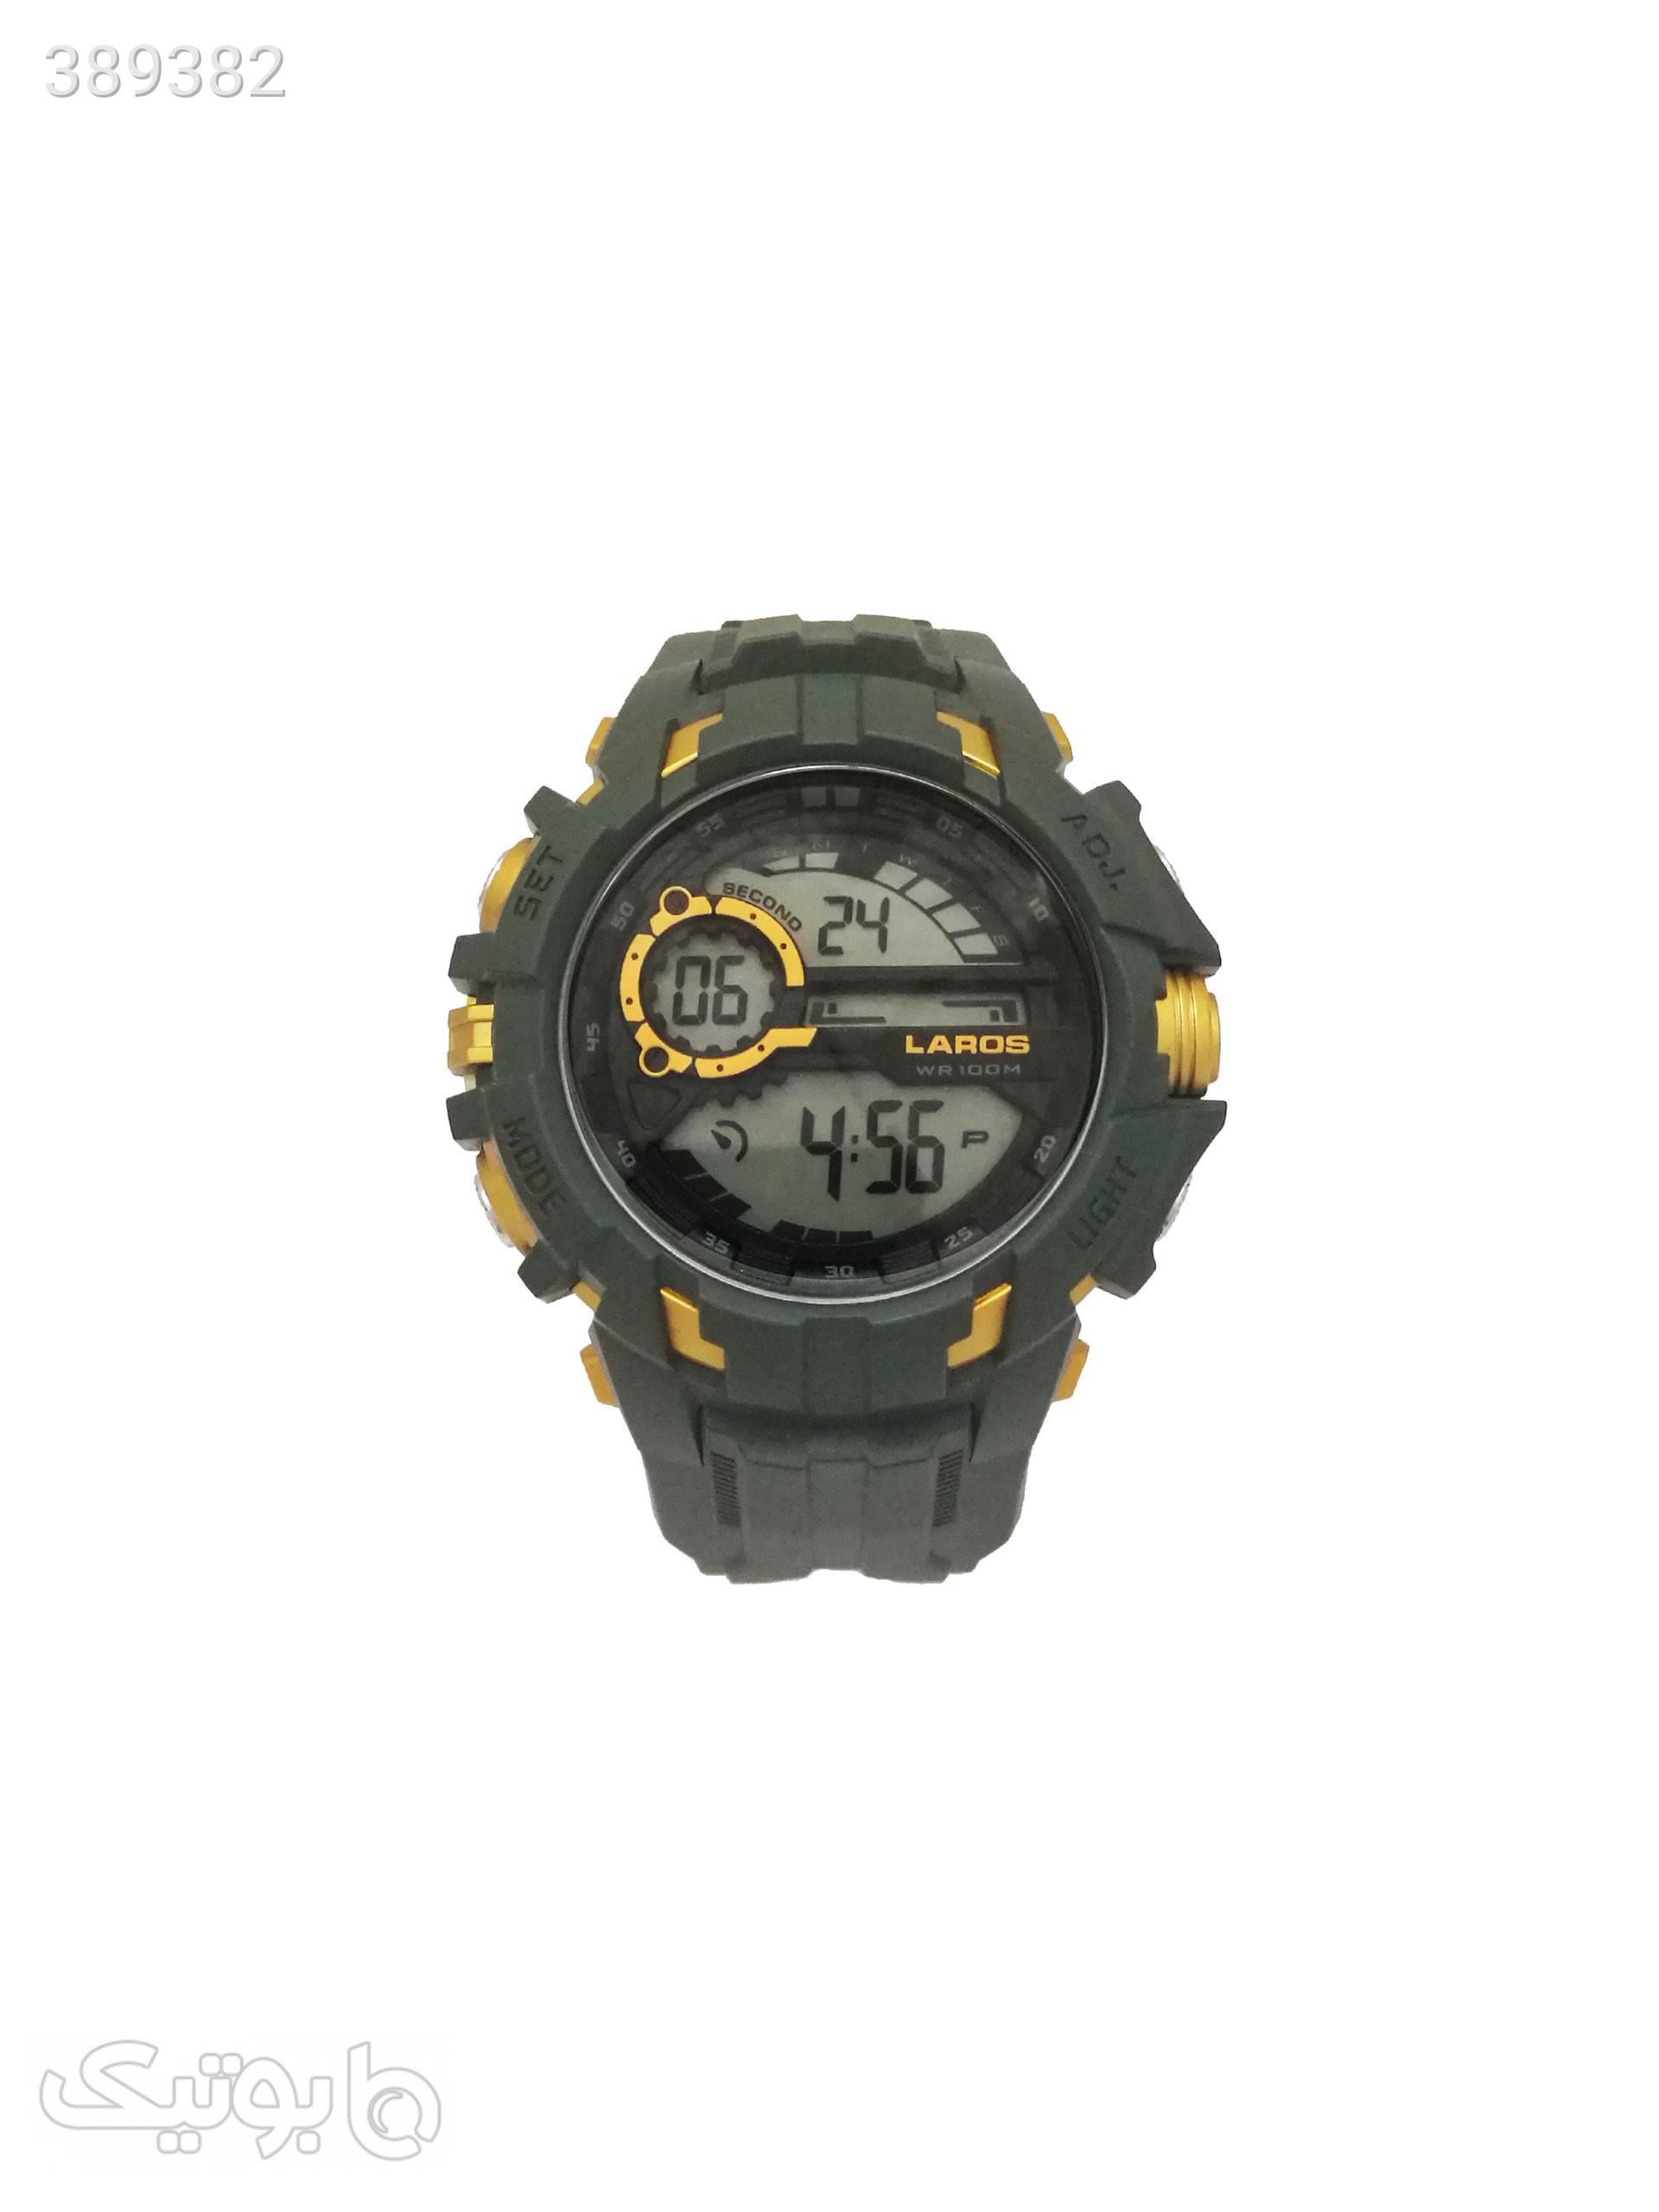 ساعت مچی دیجیتالی لاروس مدل0817-m1073 طوسی ساعت